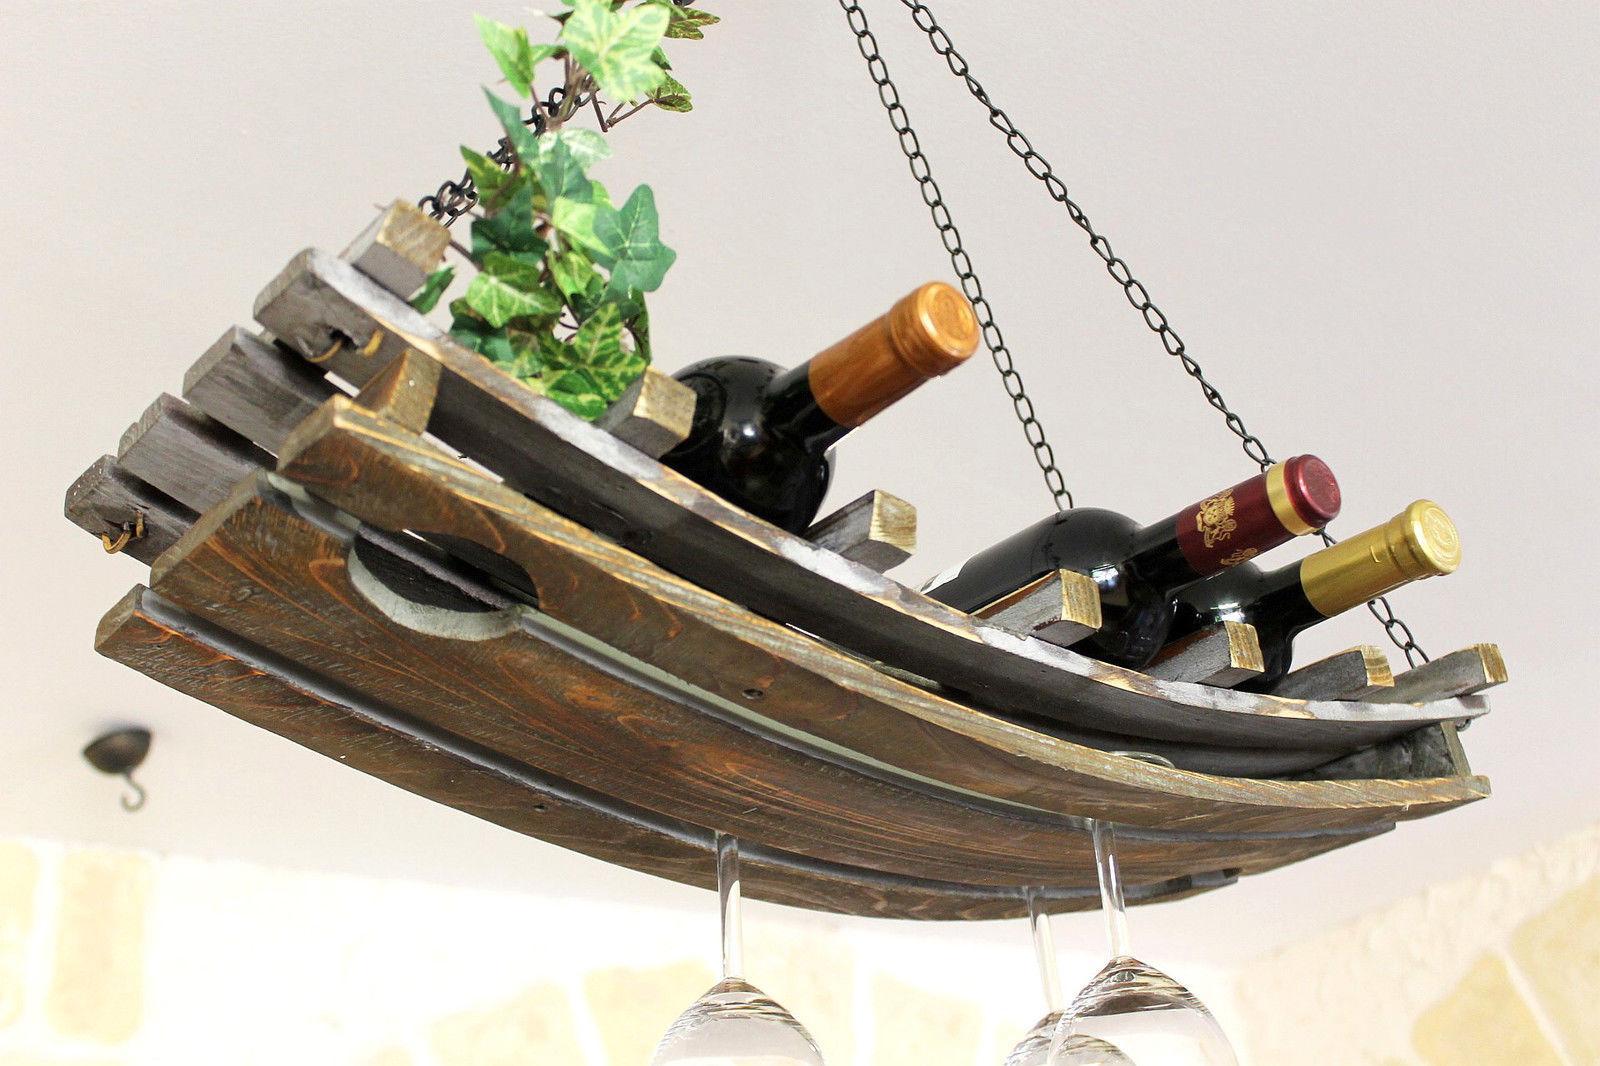 Weinregal Deckenregal Holz 65cm Hangeregal Flaschenhalter Flaschenregal Decke Ebay